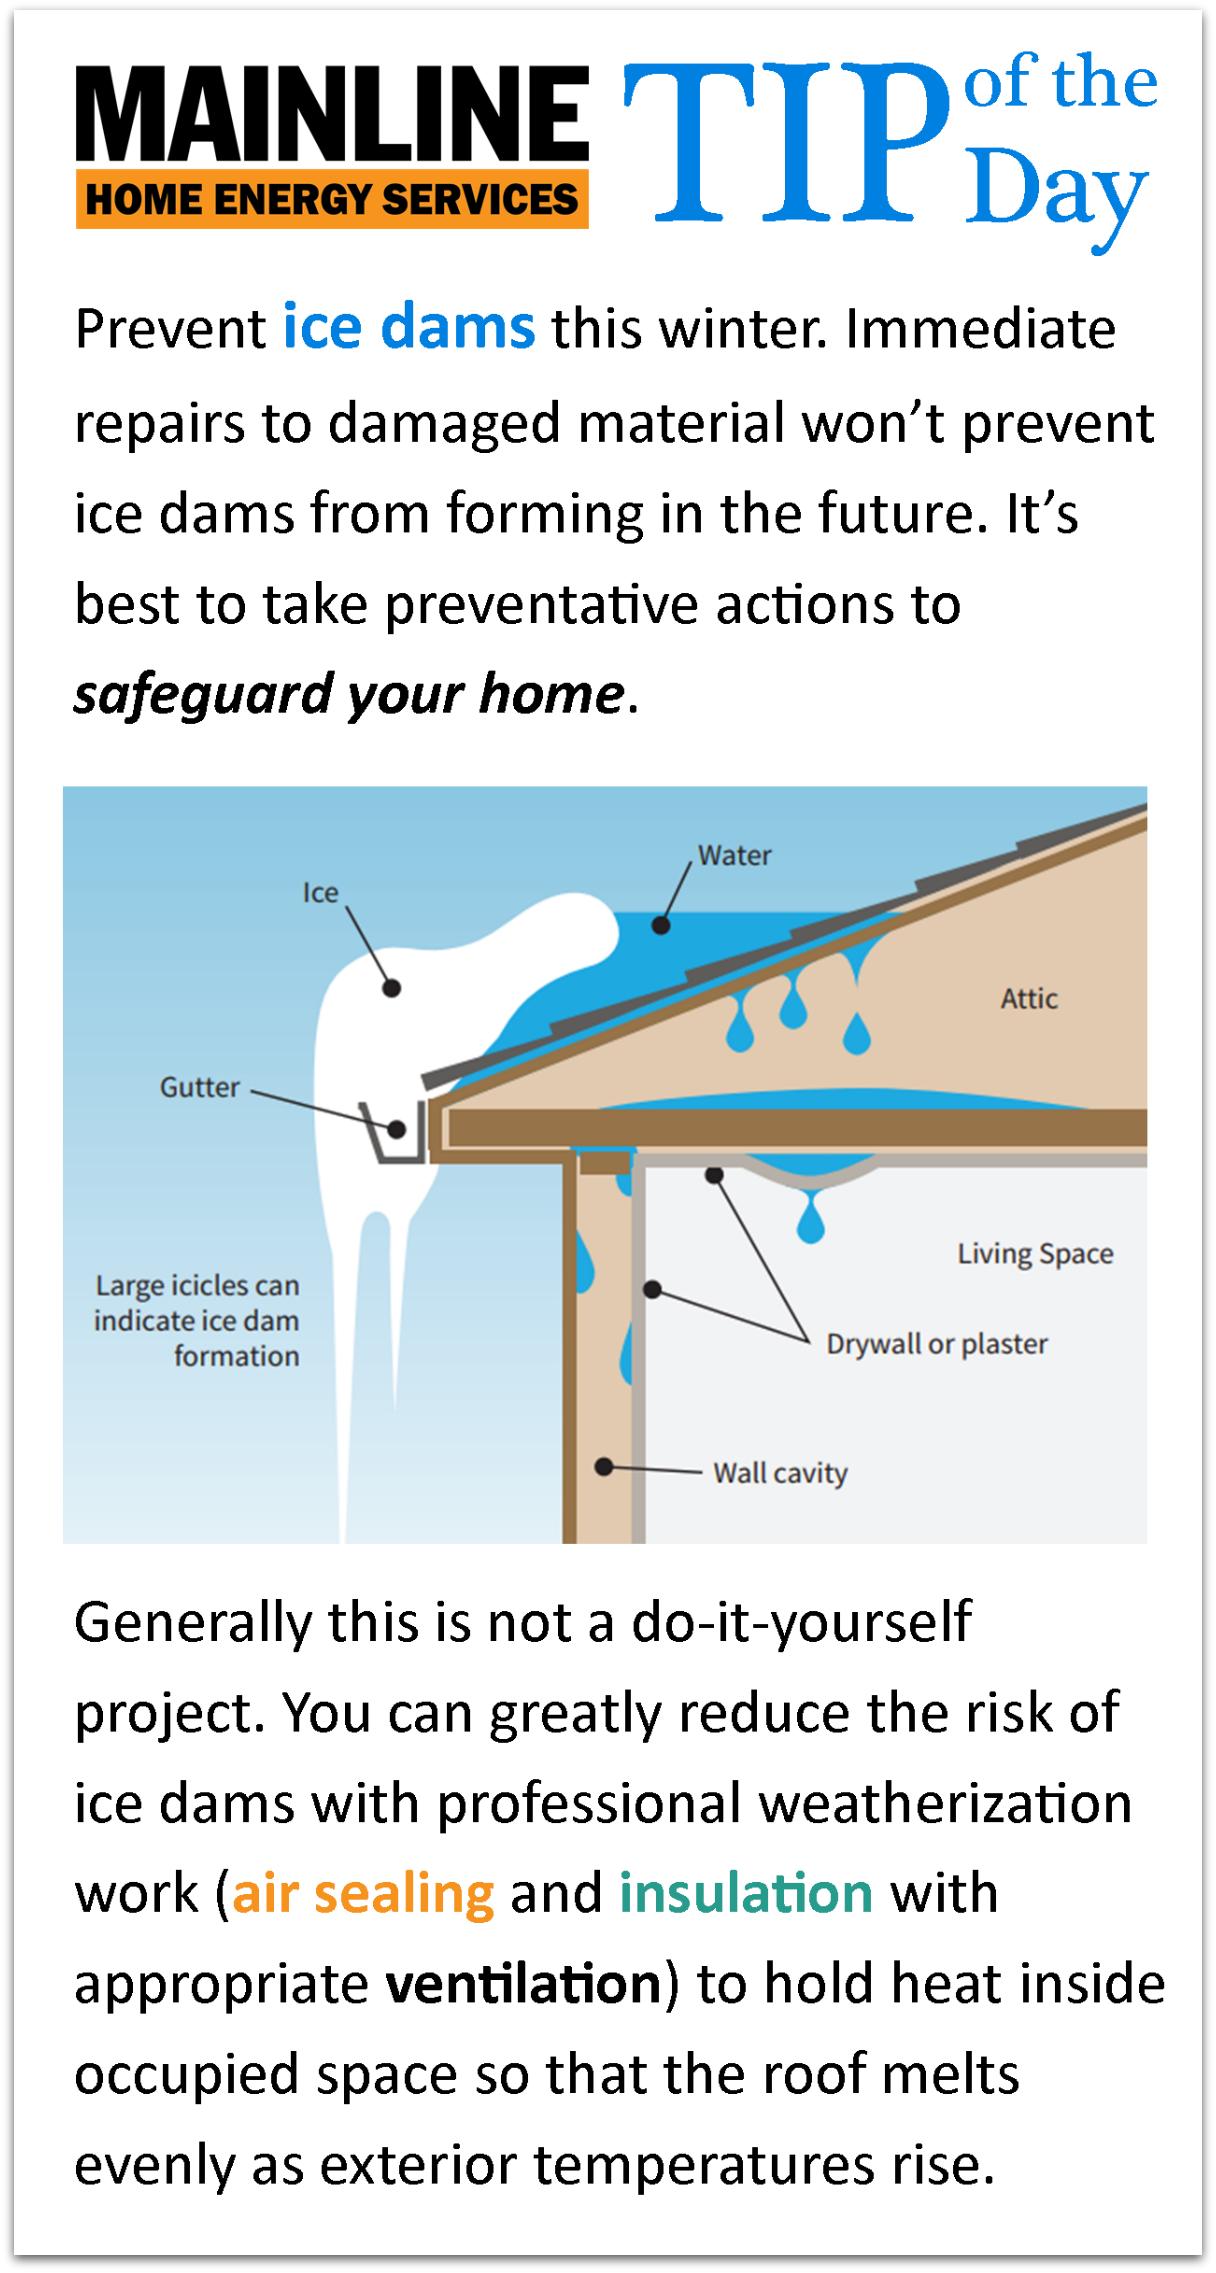 Icedams Icicles Ice Damage Attic Insulation Ice Dams Energy Services